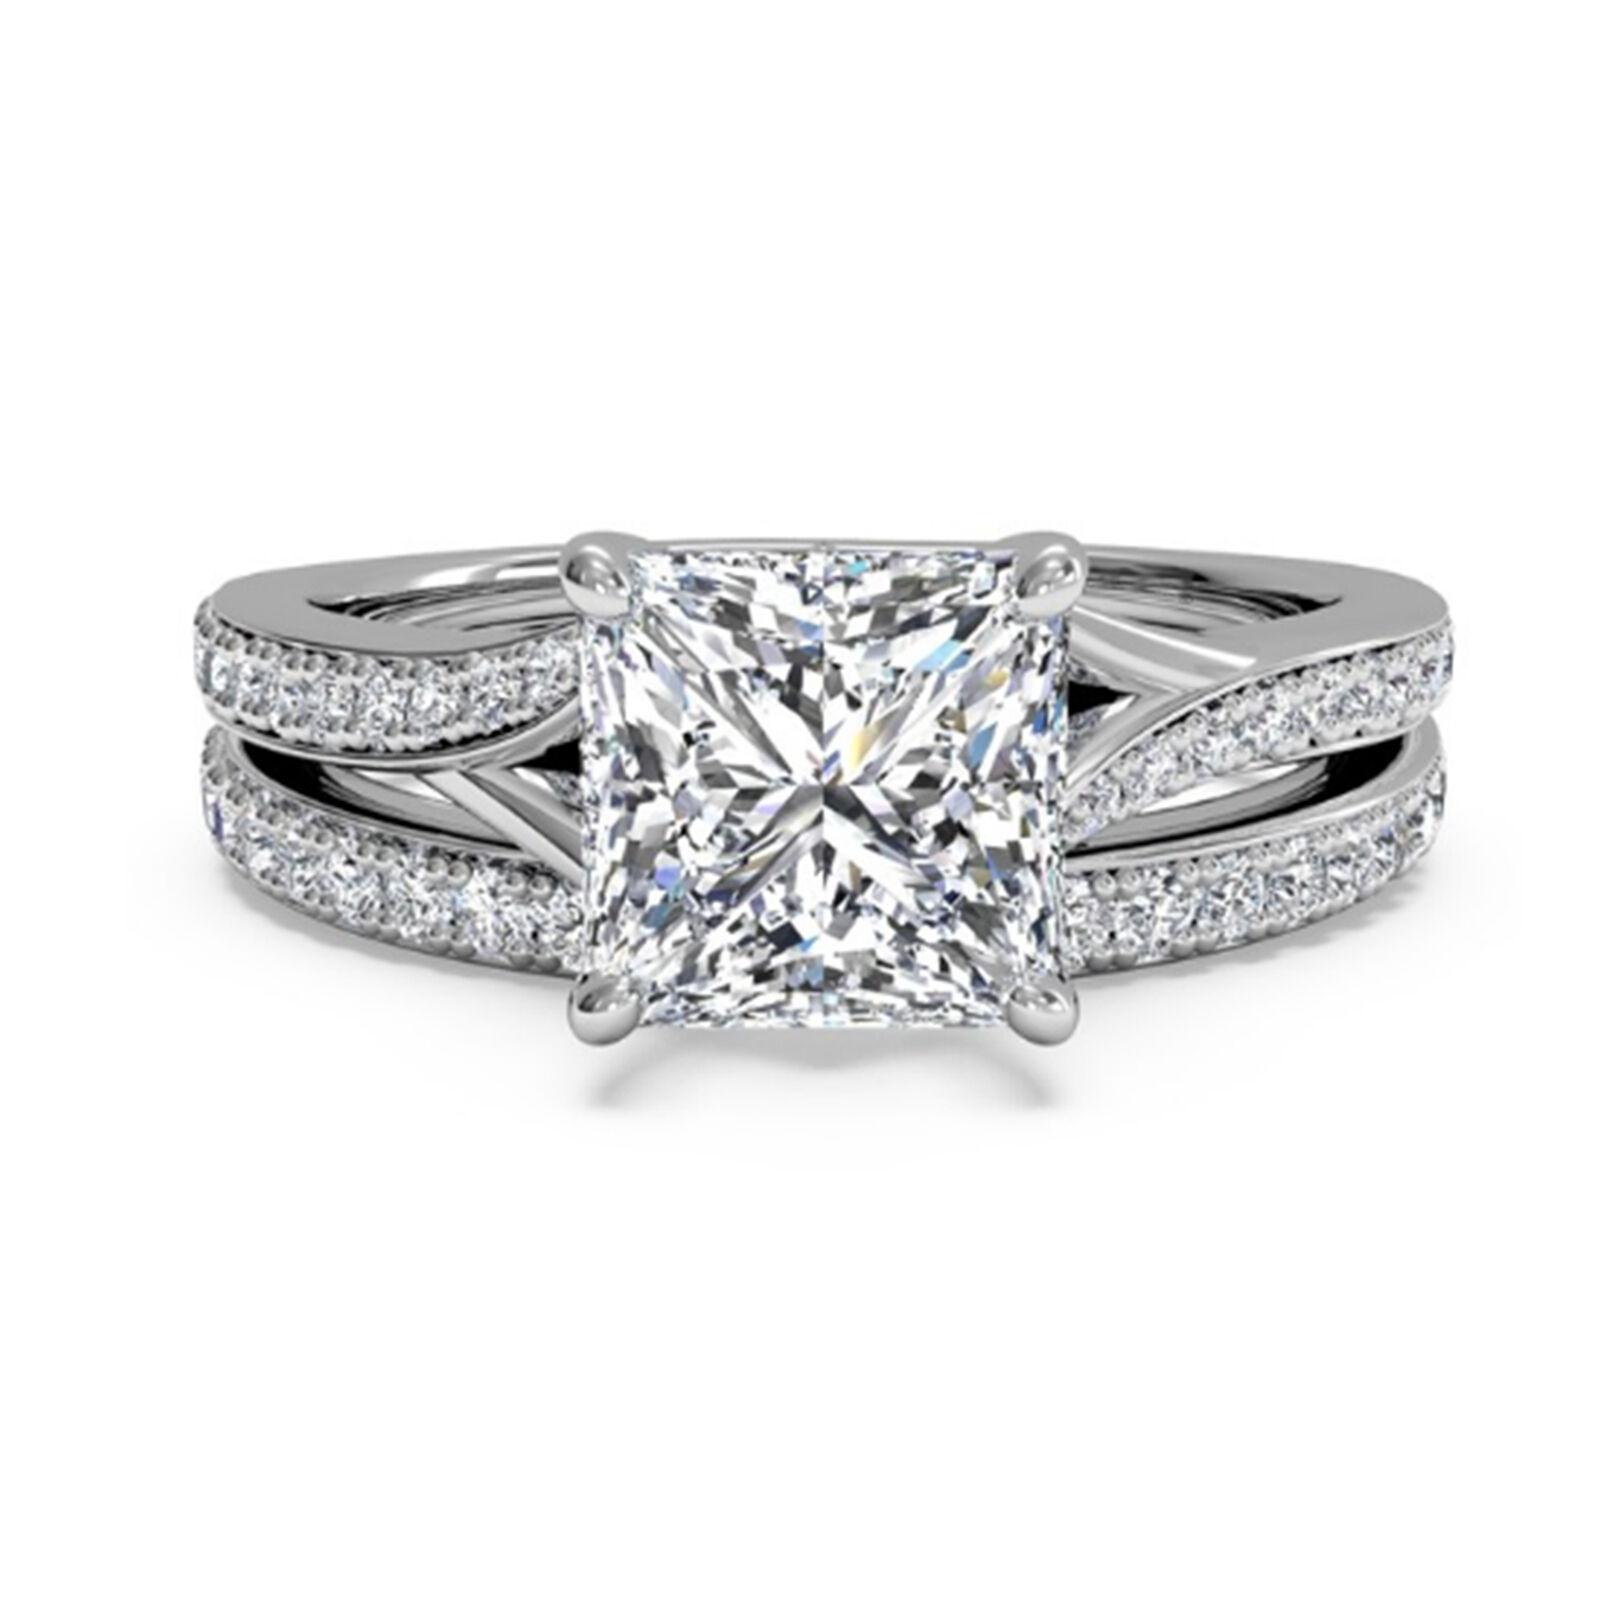 Bridal 1.50 Ct  Diamond Wedding Engagement Ring Set 14K White gold Princess Cut